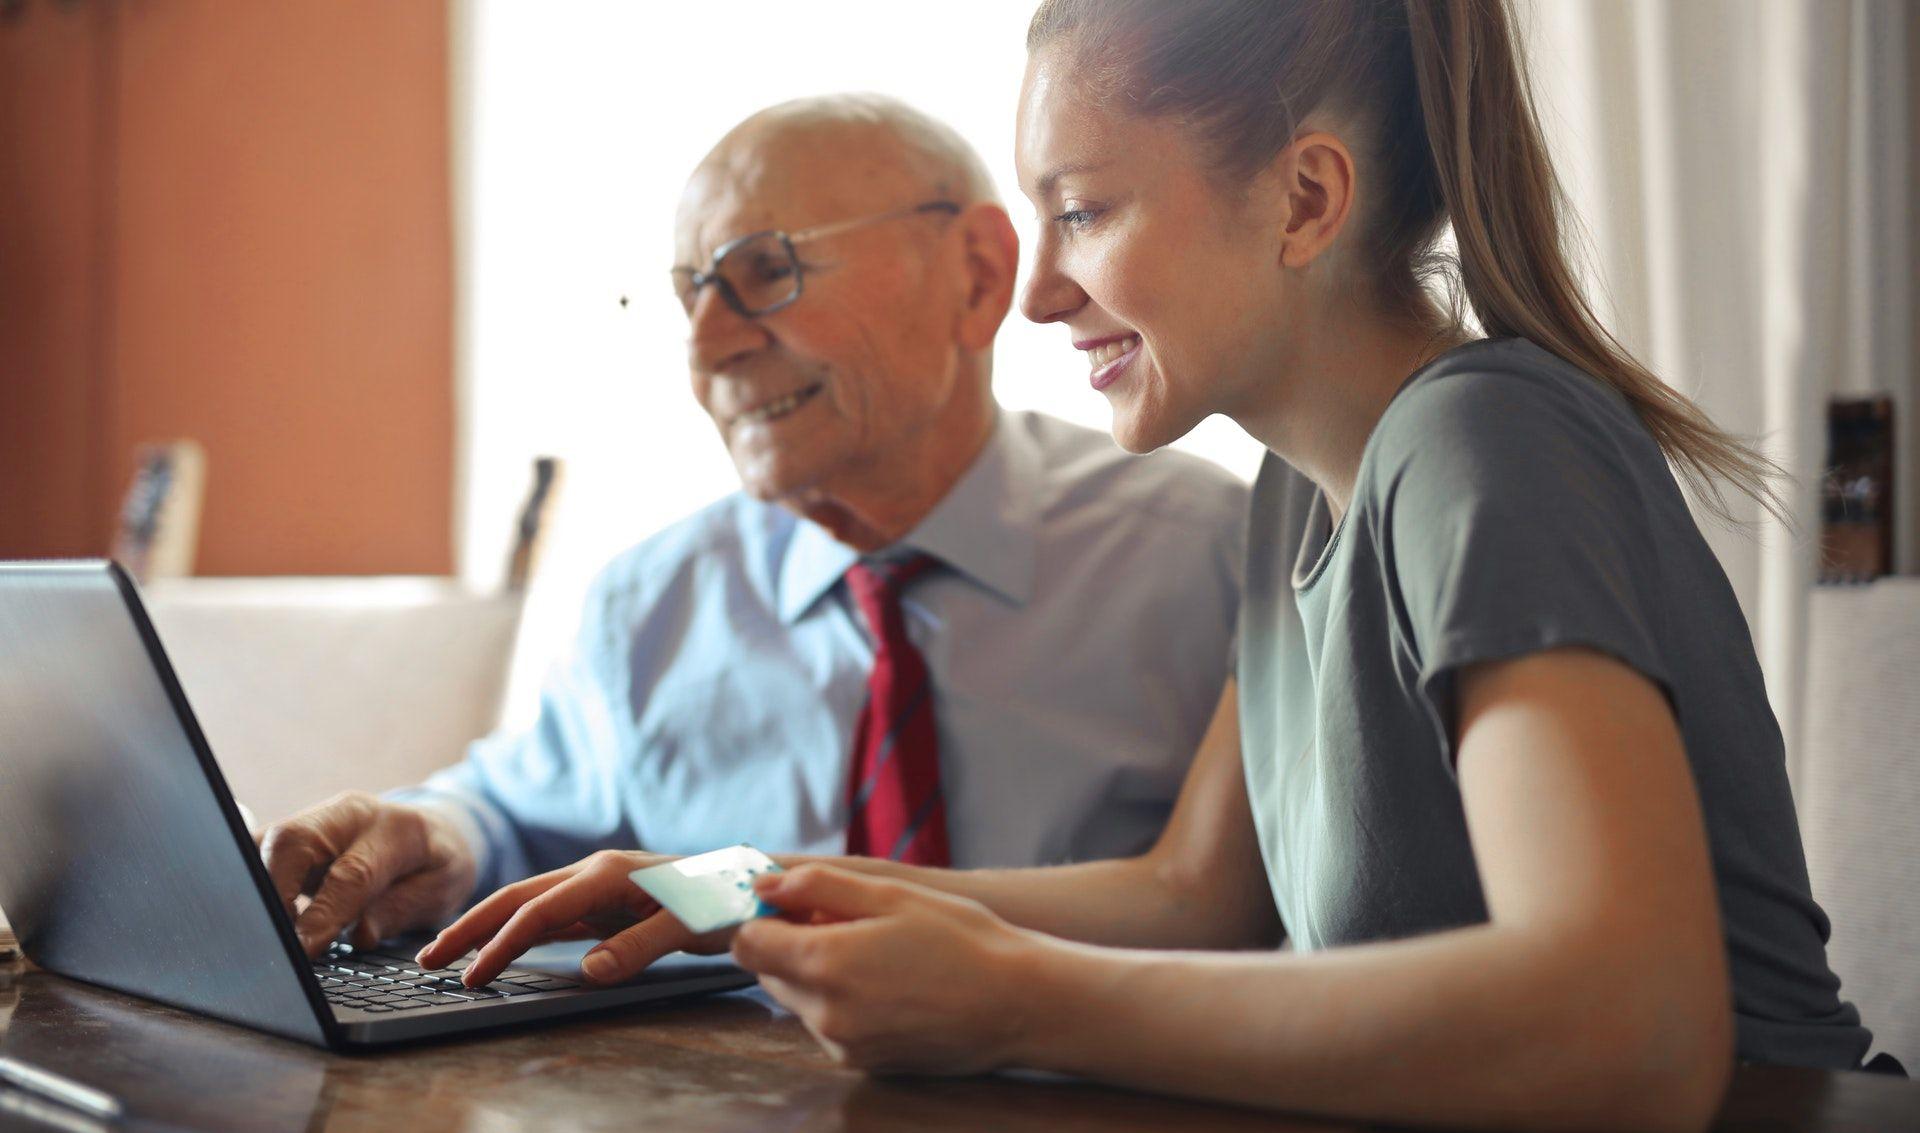 Senior gibt Azubi nachhilfe am Computer